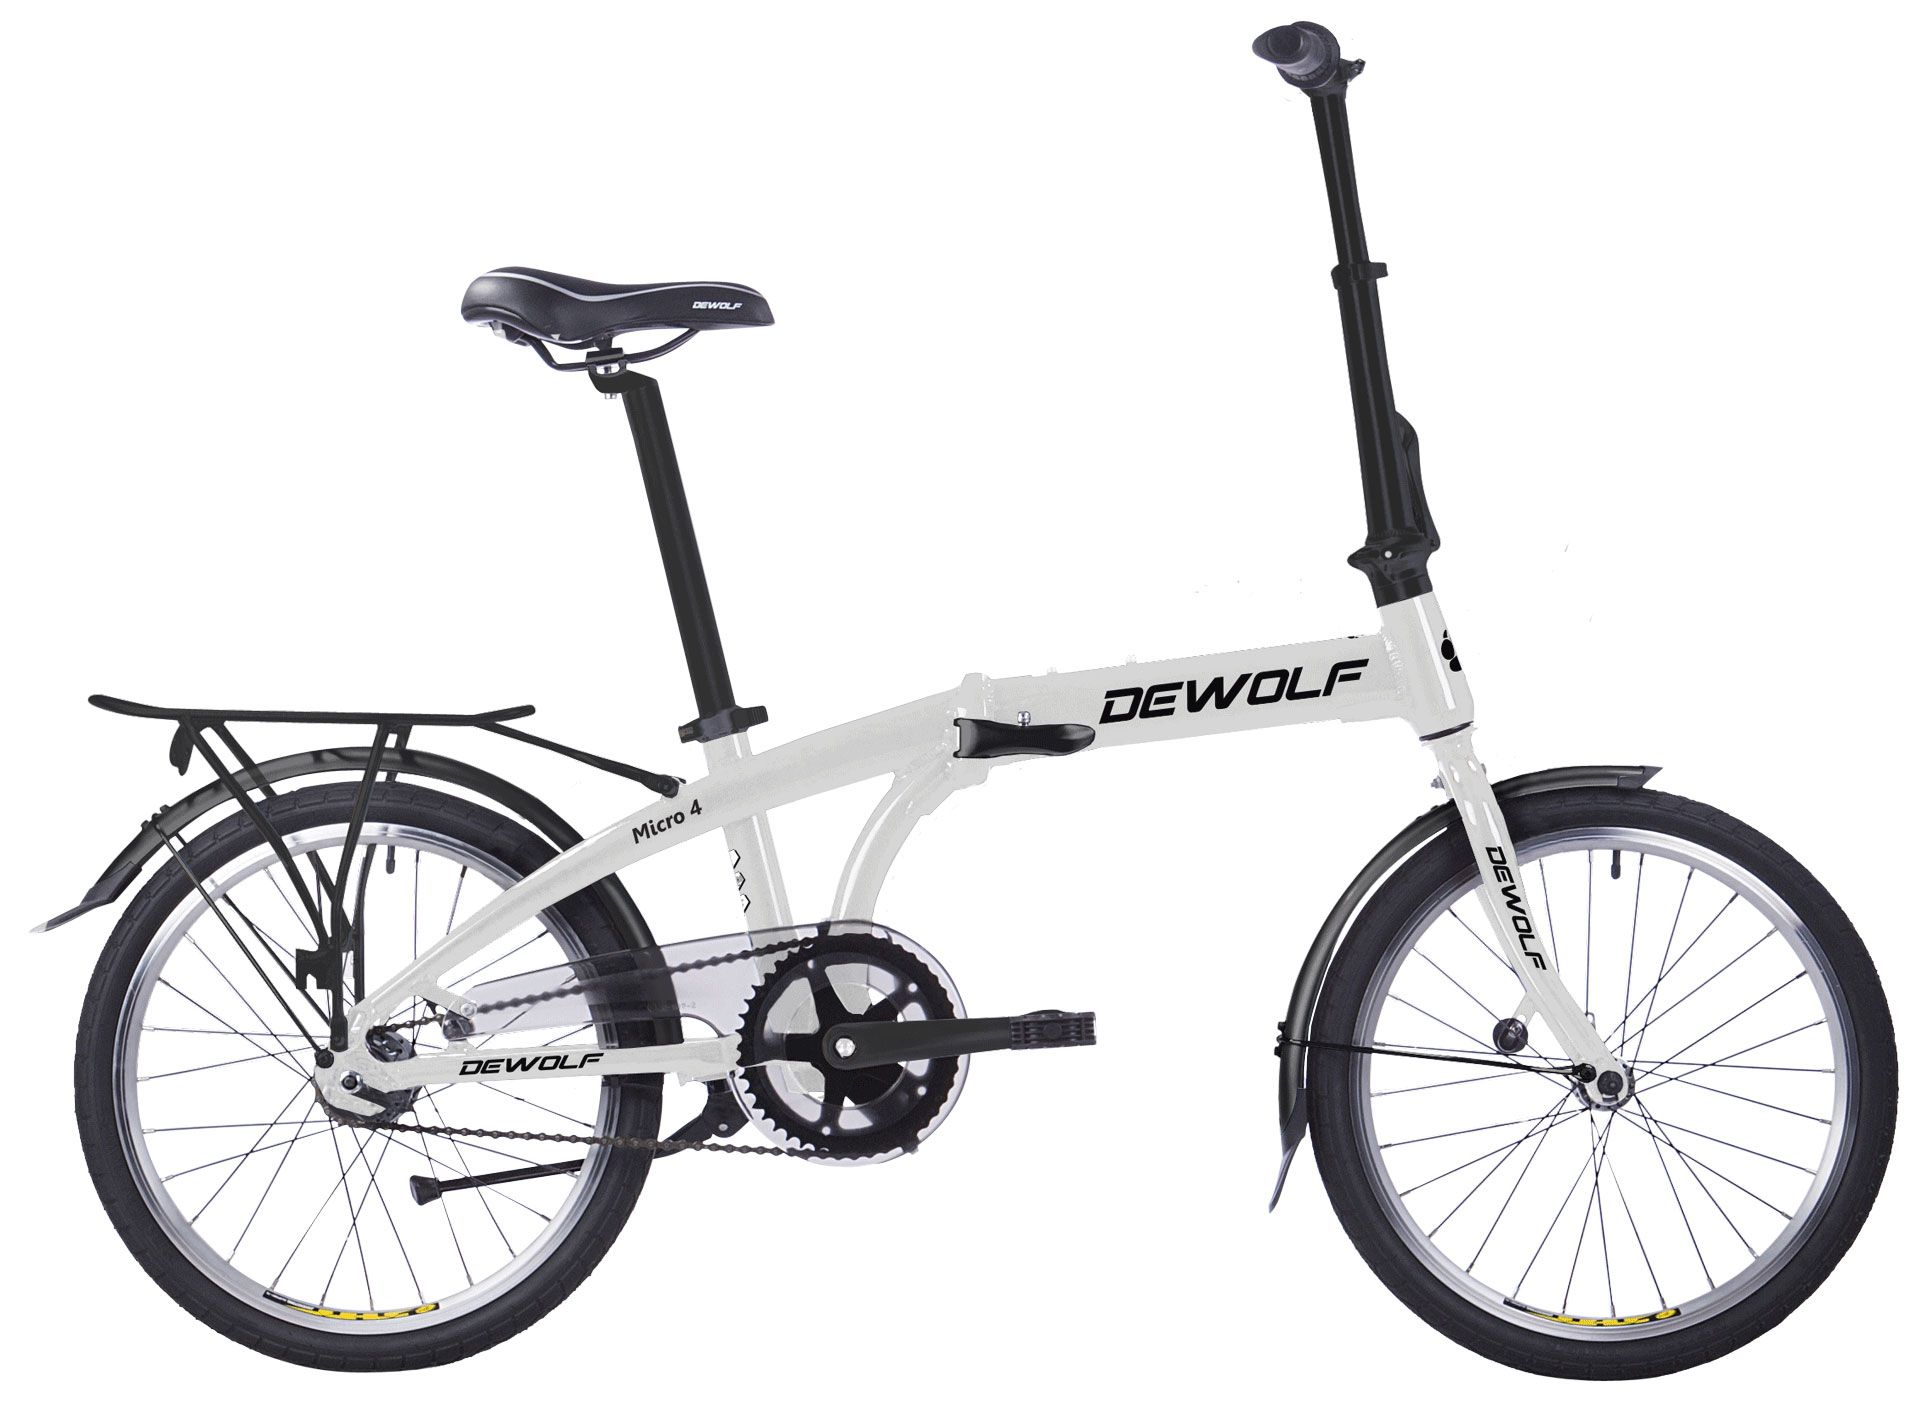 Велосипед Dewolf Micro 4 2017,  Складные  - артикул:282784